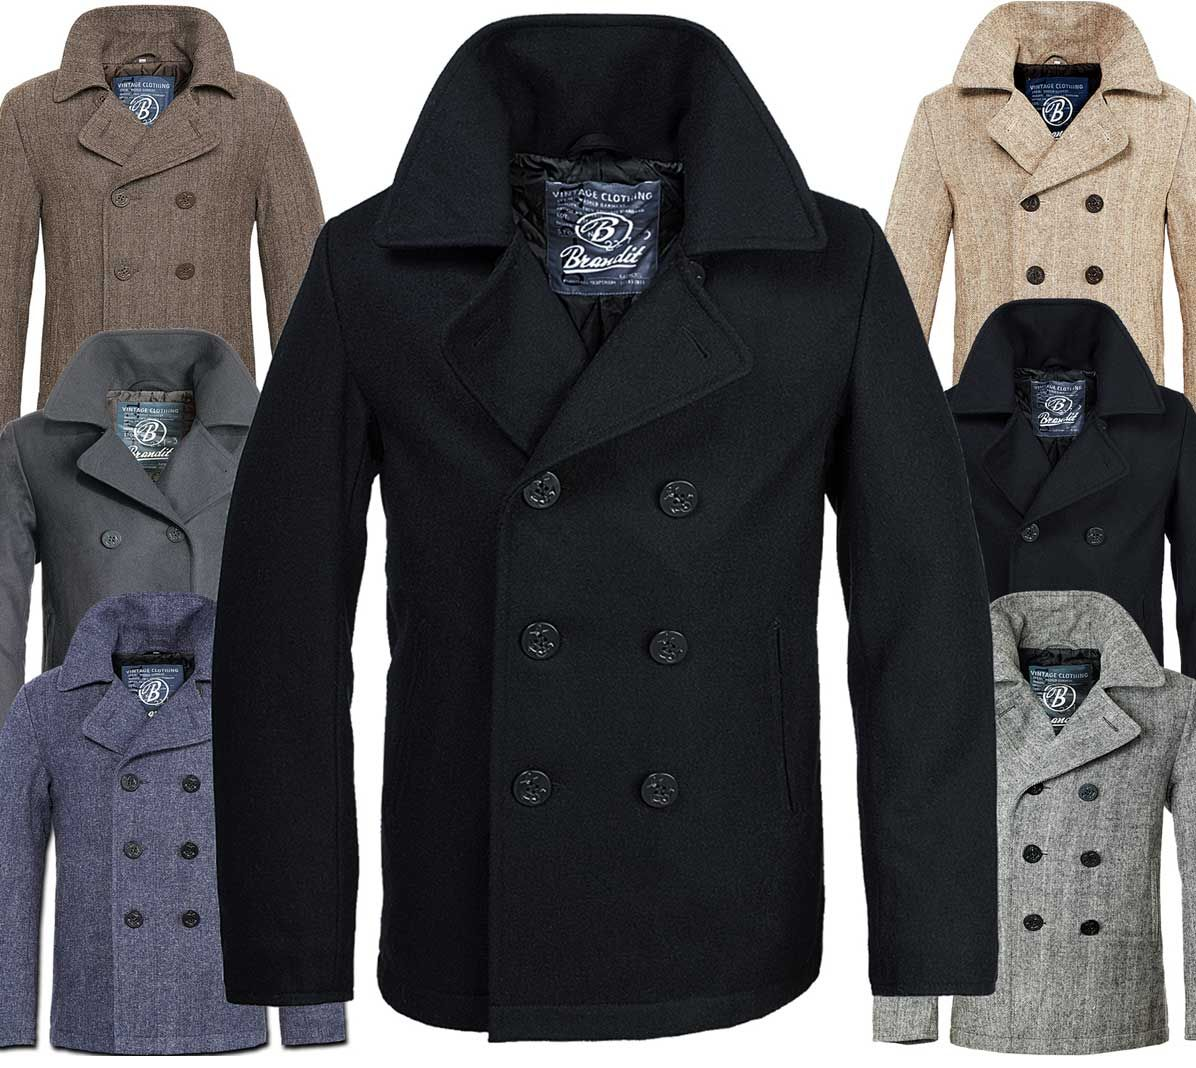 pea-coats-for-men.jpg | Pea Coat | Pinterest